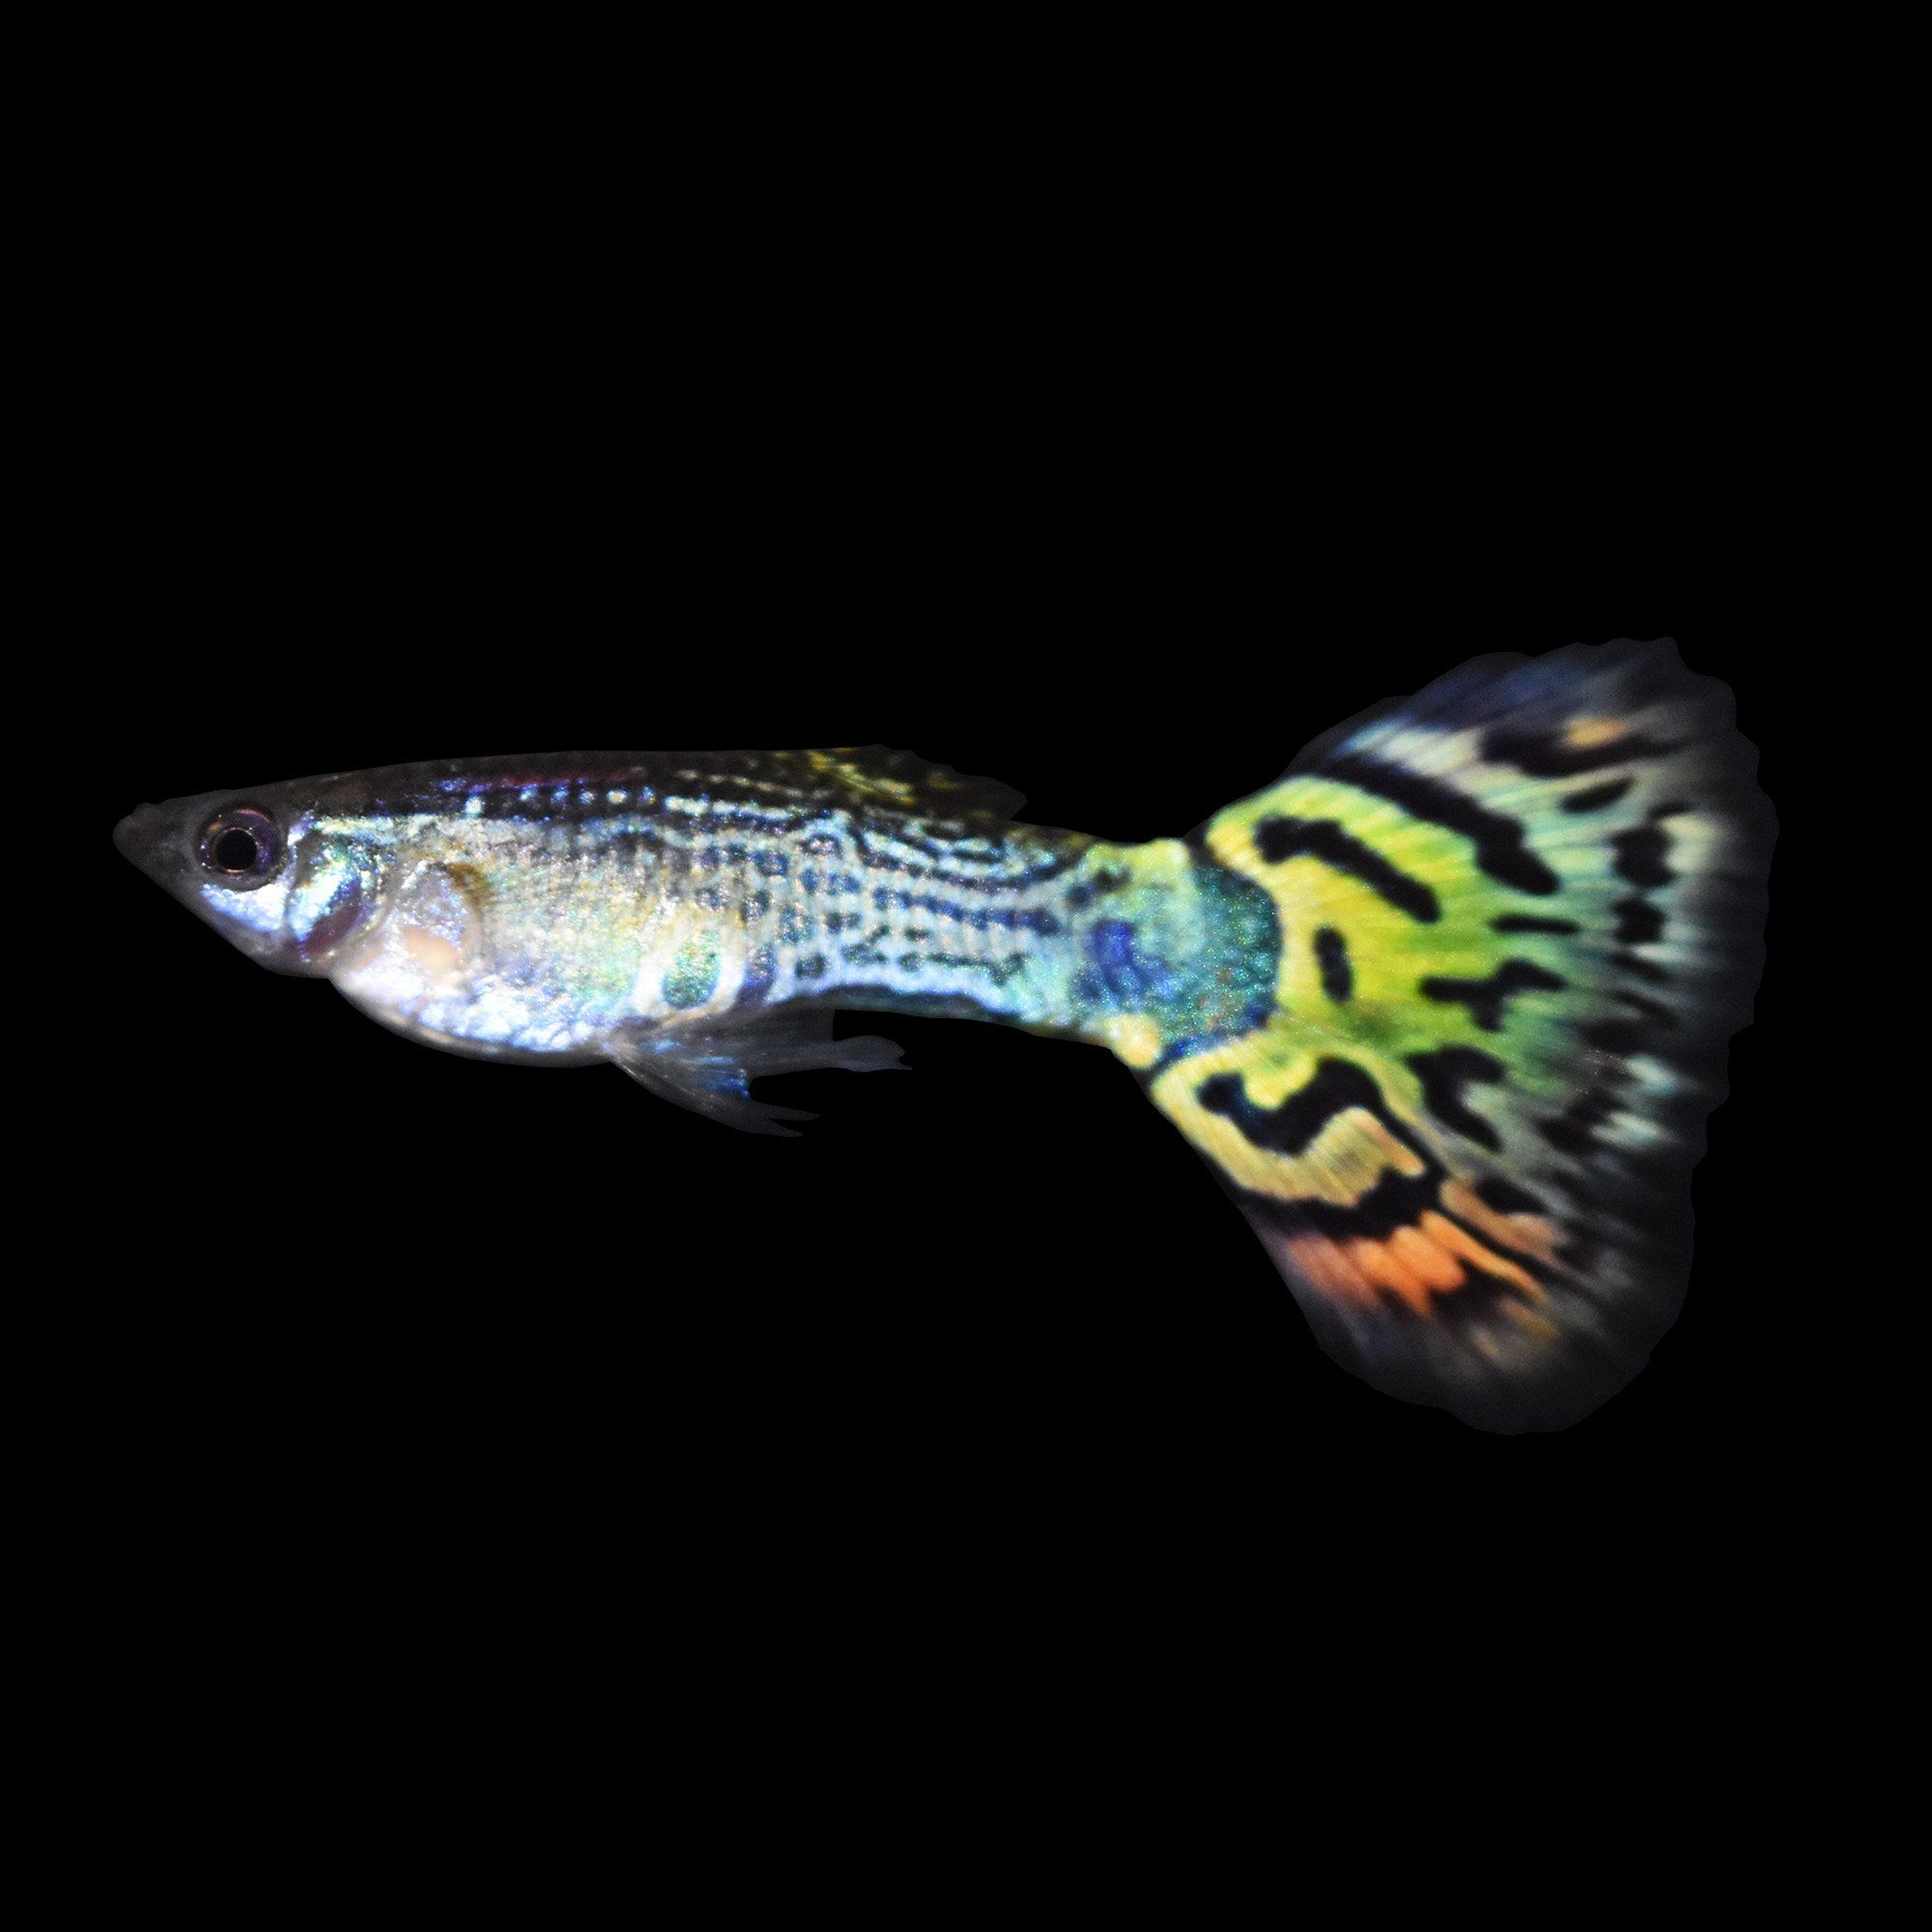 Pin By Melaniehackworth On Aquarium Fish In 2020 Tropical Fish Aquarium Fish Pet Fish